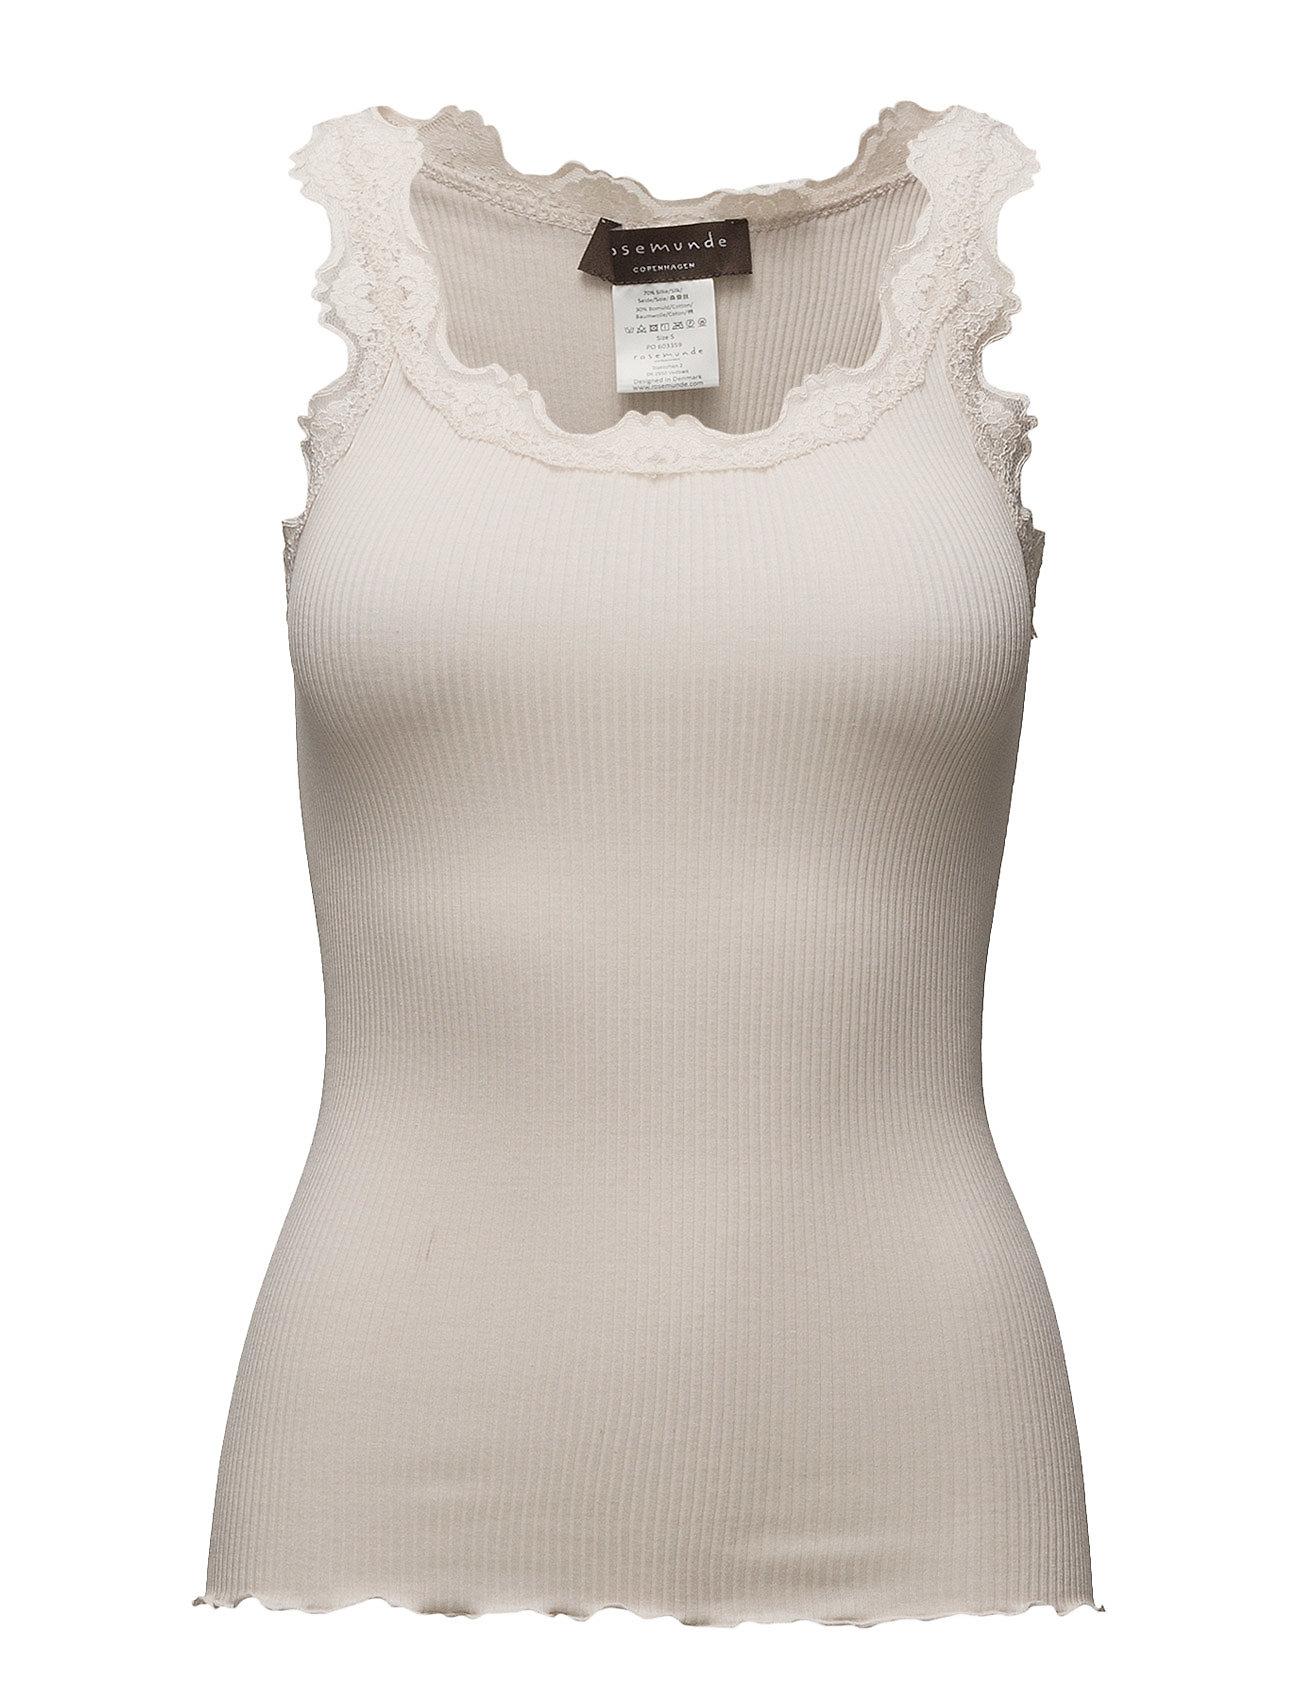 Rosemunde Silk top regular w/vintage lace - SOFT POWDER